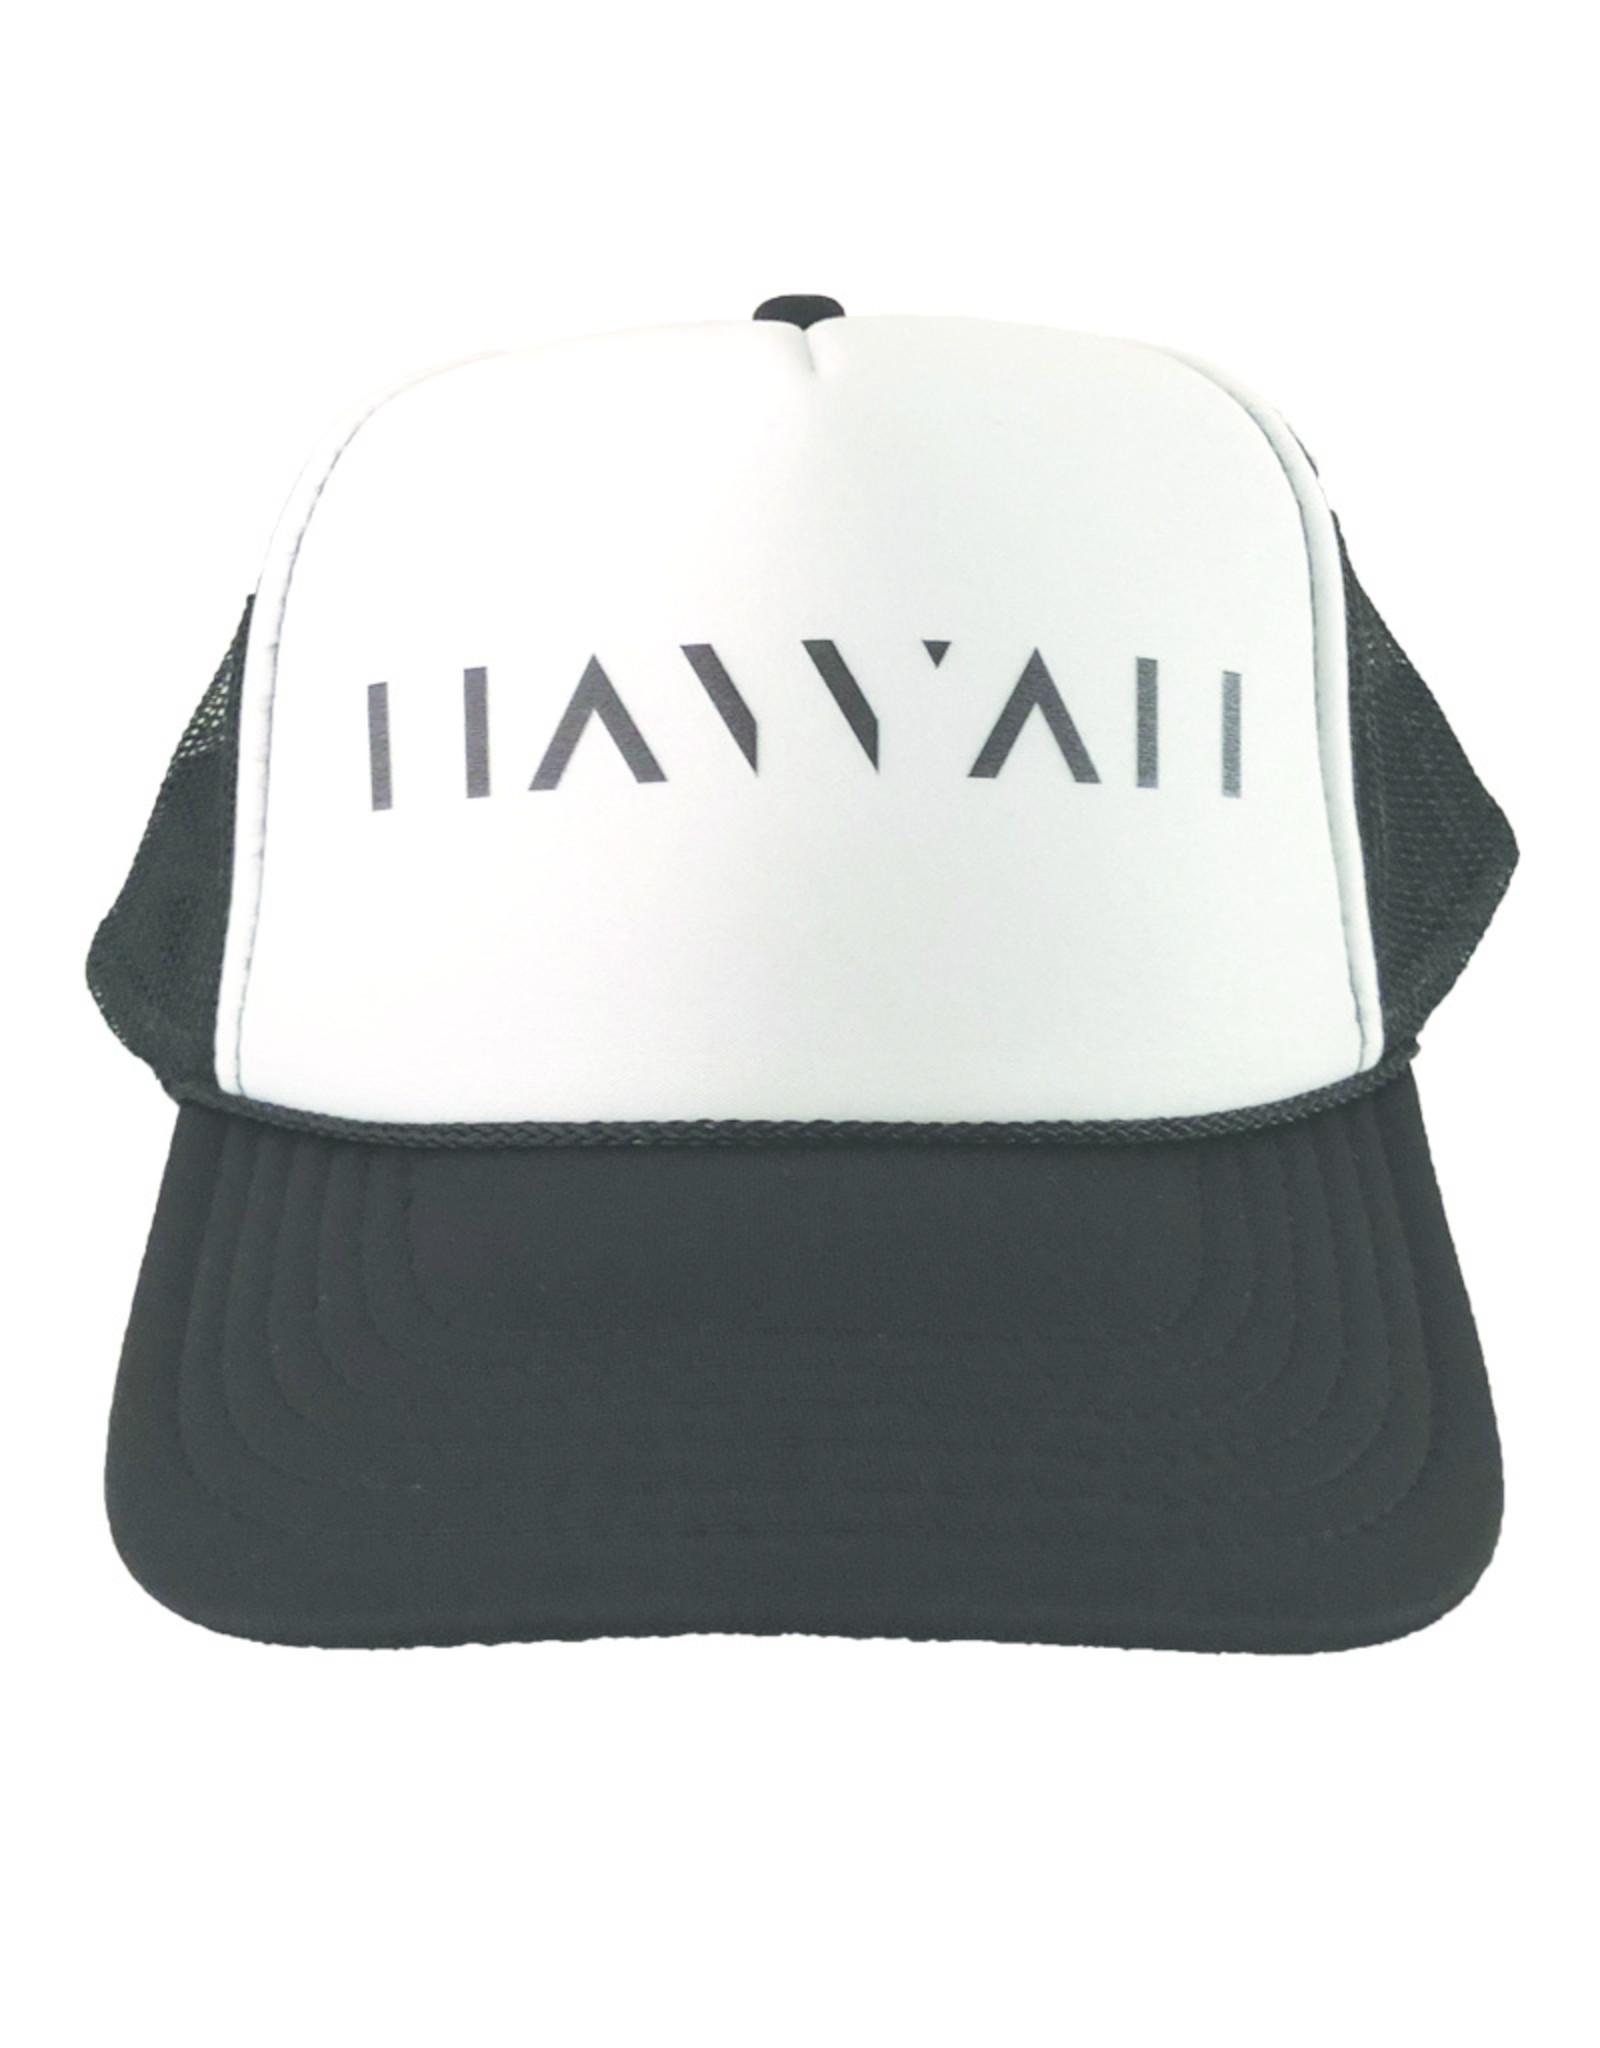 11AWA11 CLASSIC trucker cap